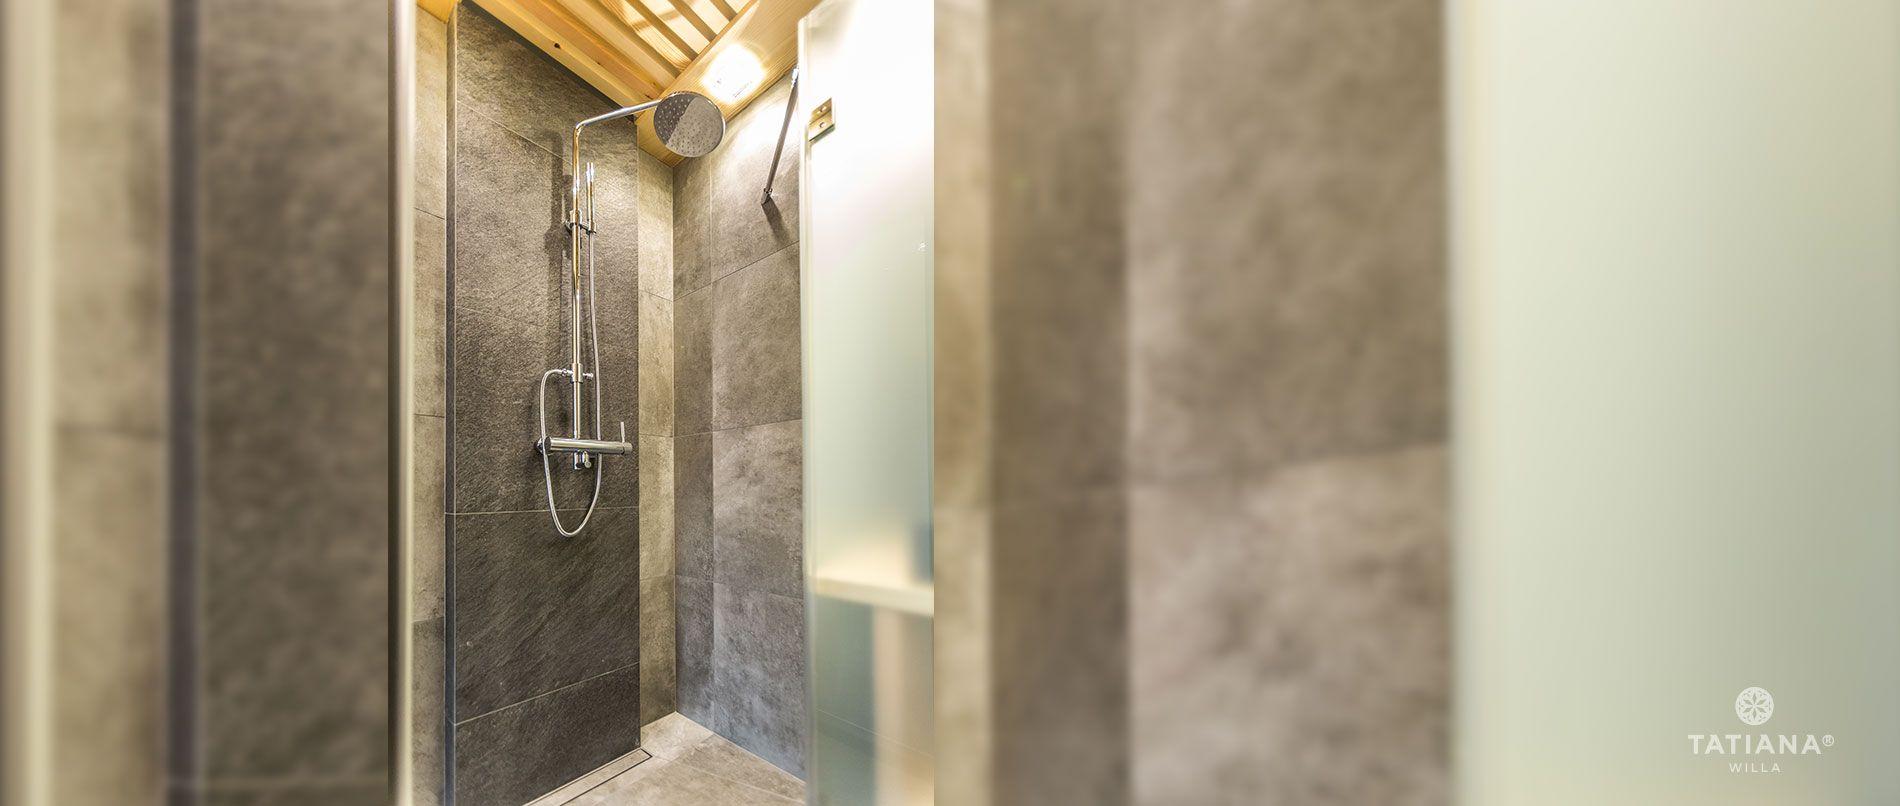 Apartament Alpejski - prysznic